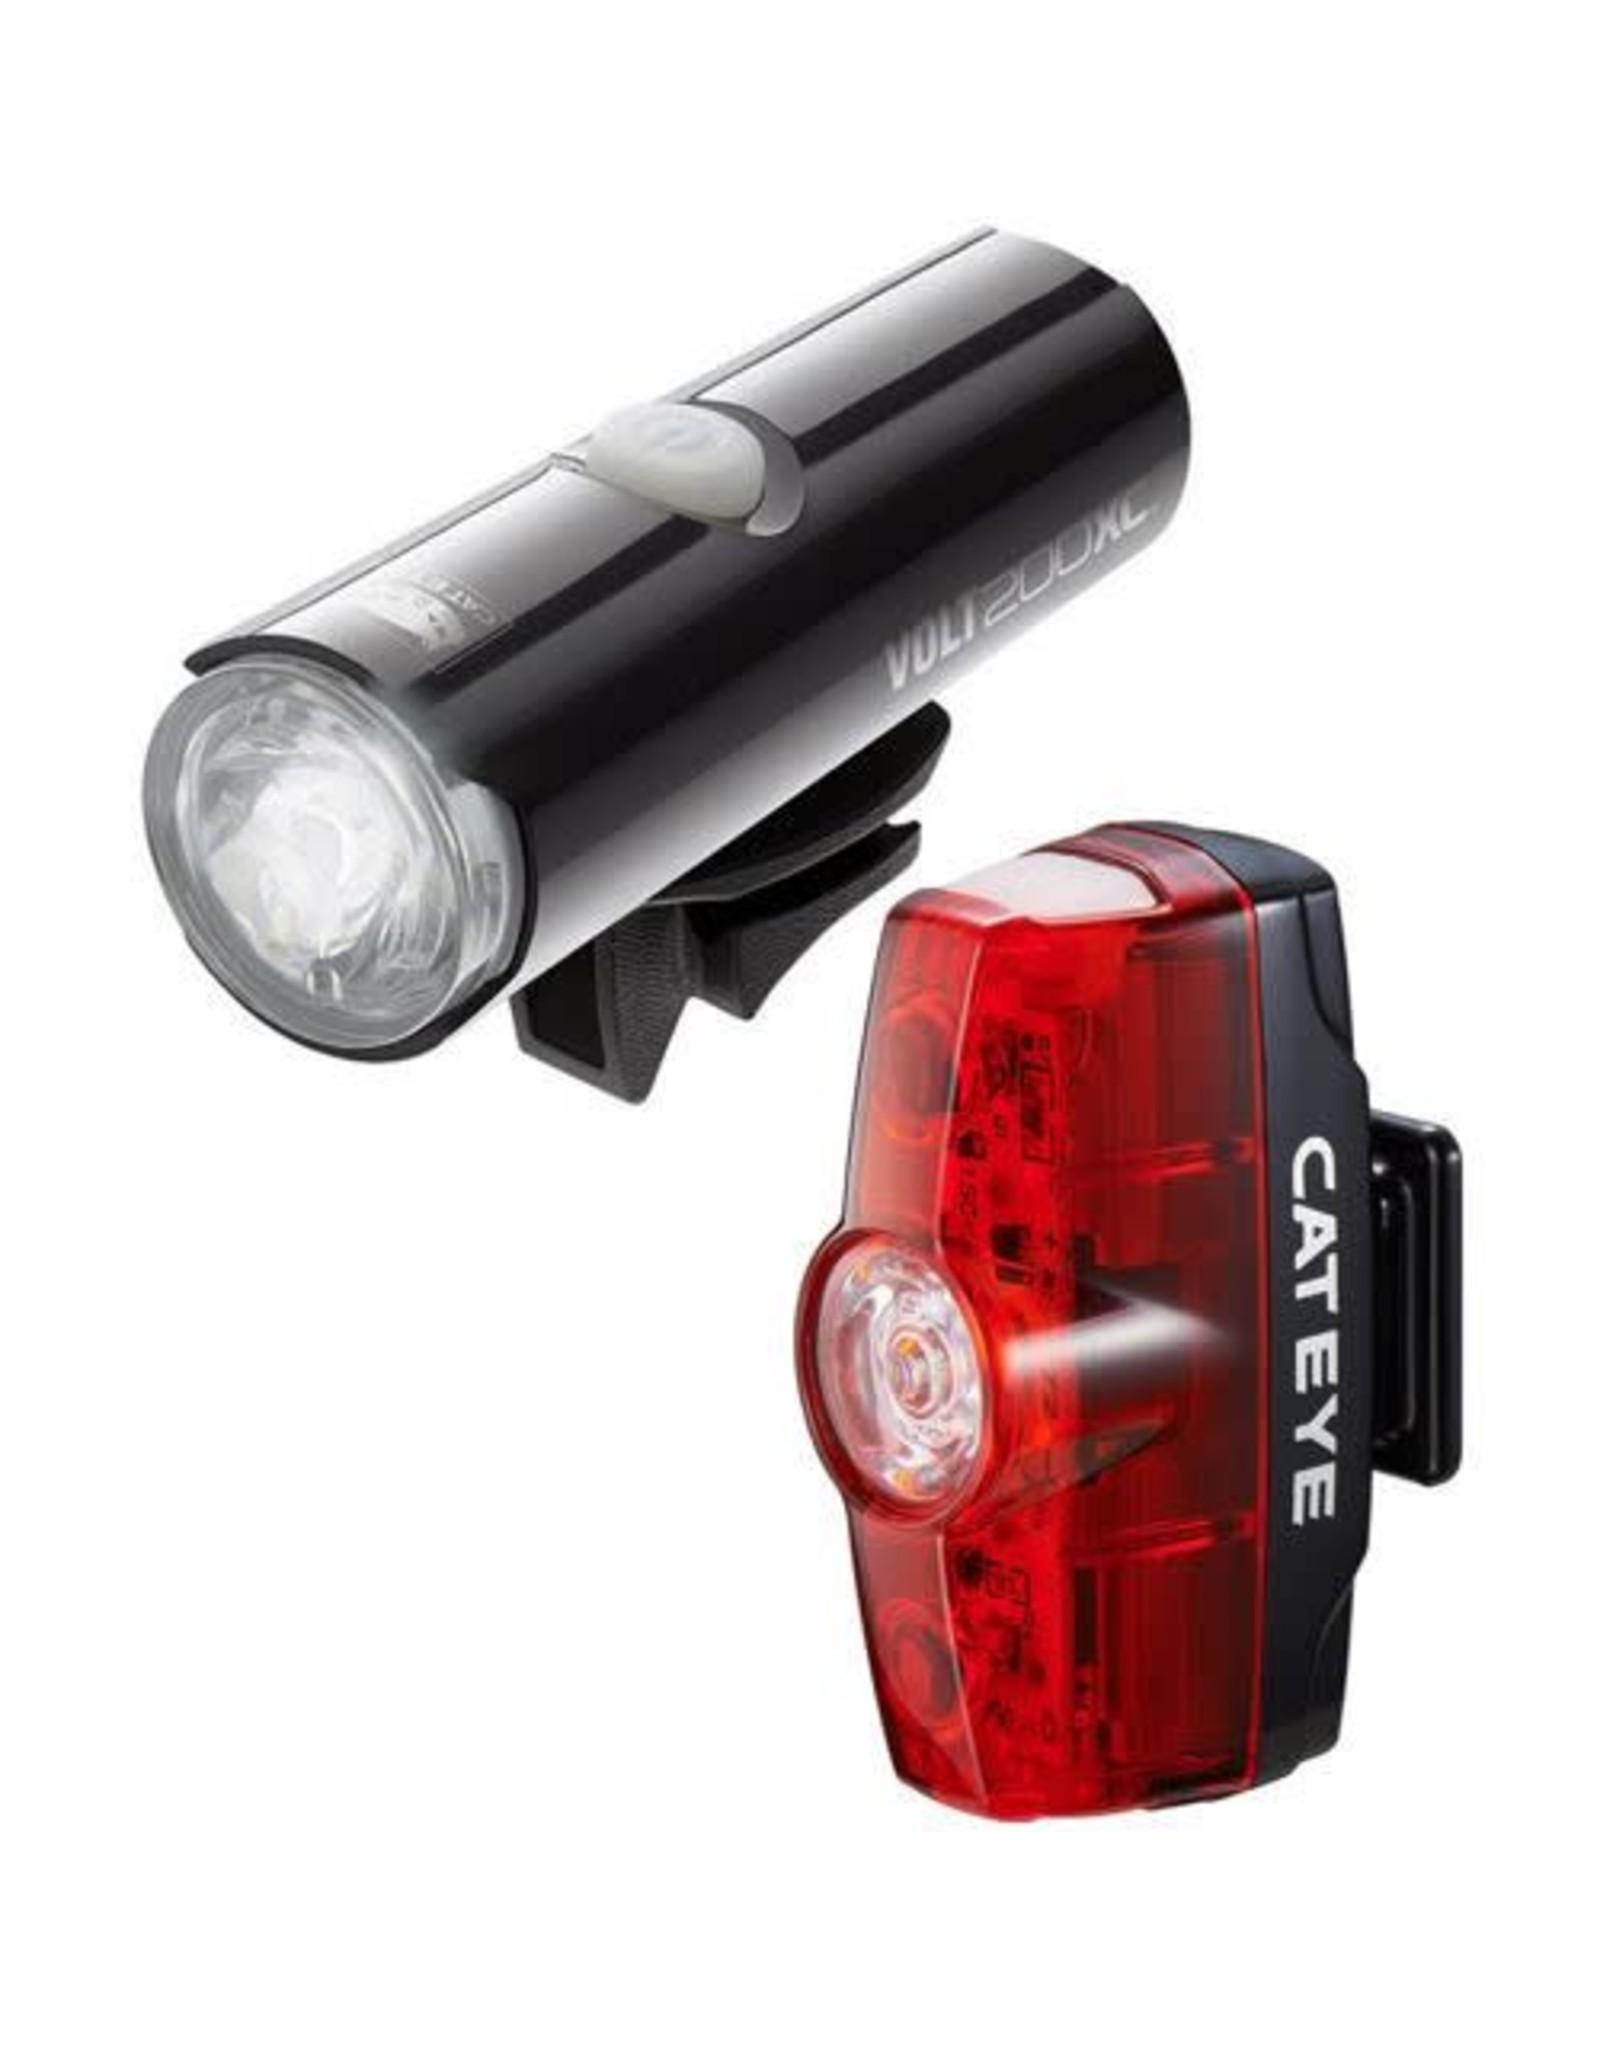 CAT EYE Volt 200 XC Rechargeable Headlight and Rapid Mini Rear Bike Light